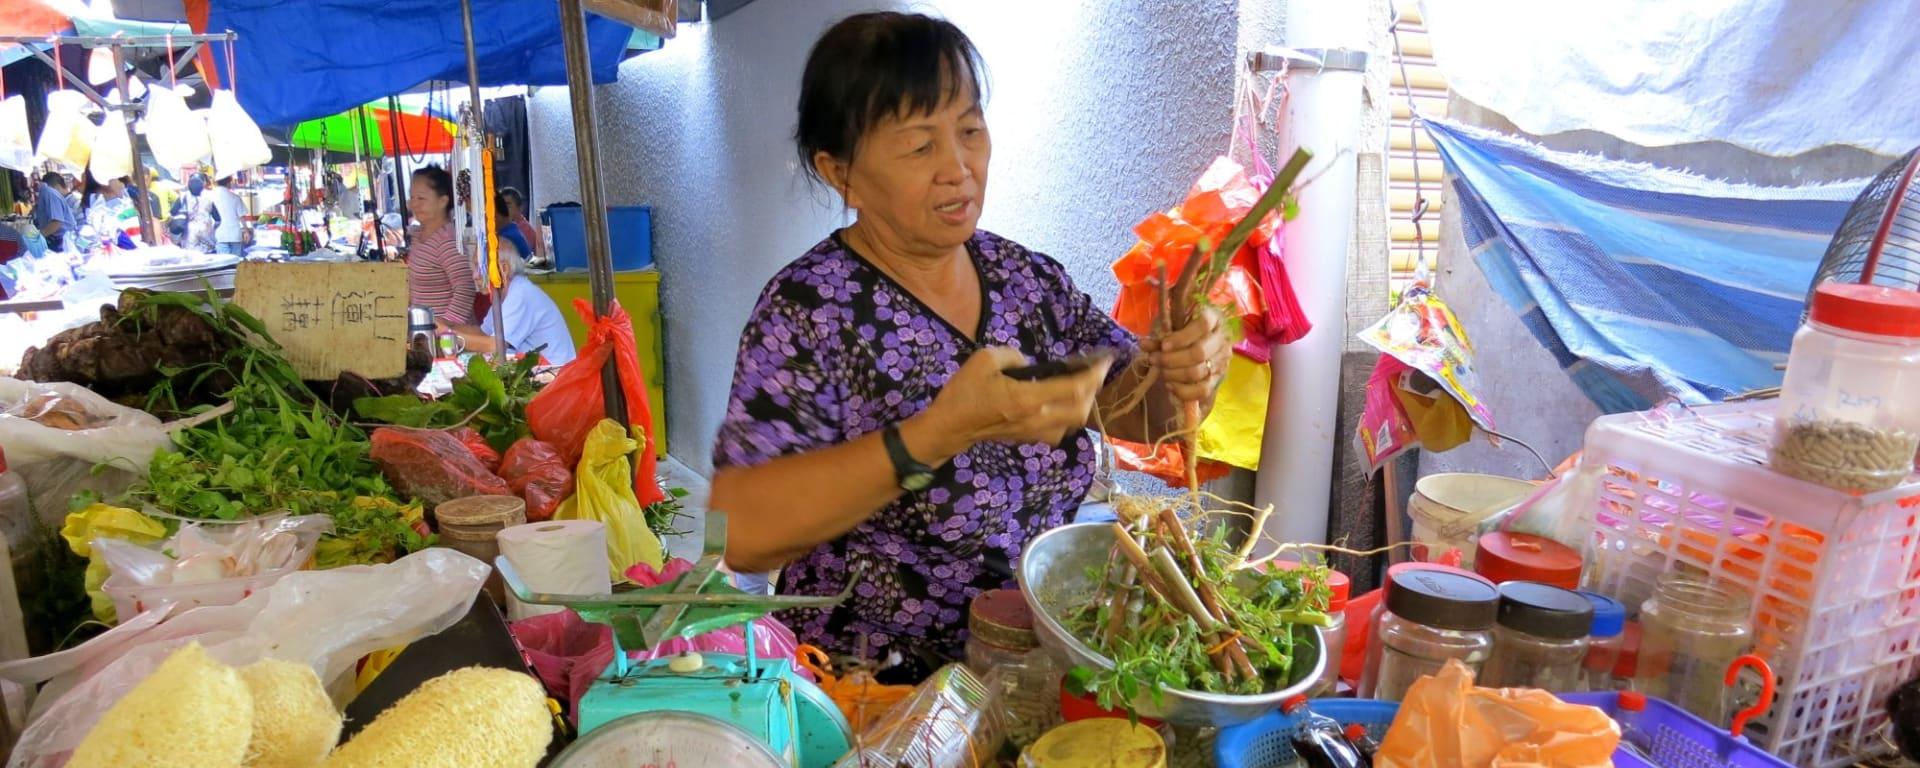 K.L. zu Fuss entdecken in Kuala Lumpur: Malaysia Market